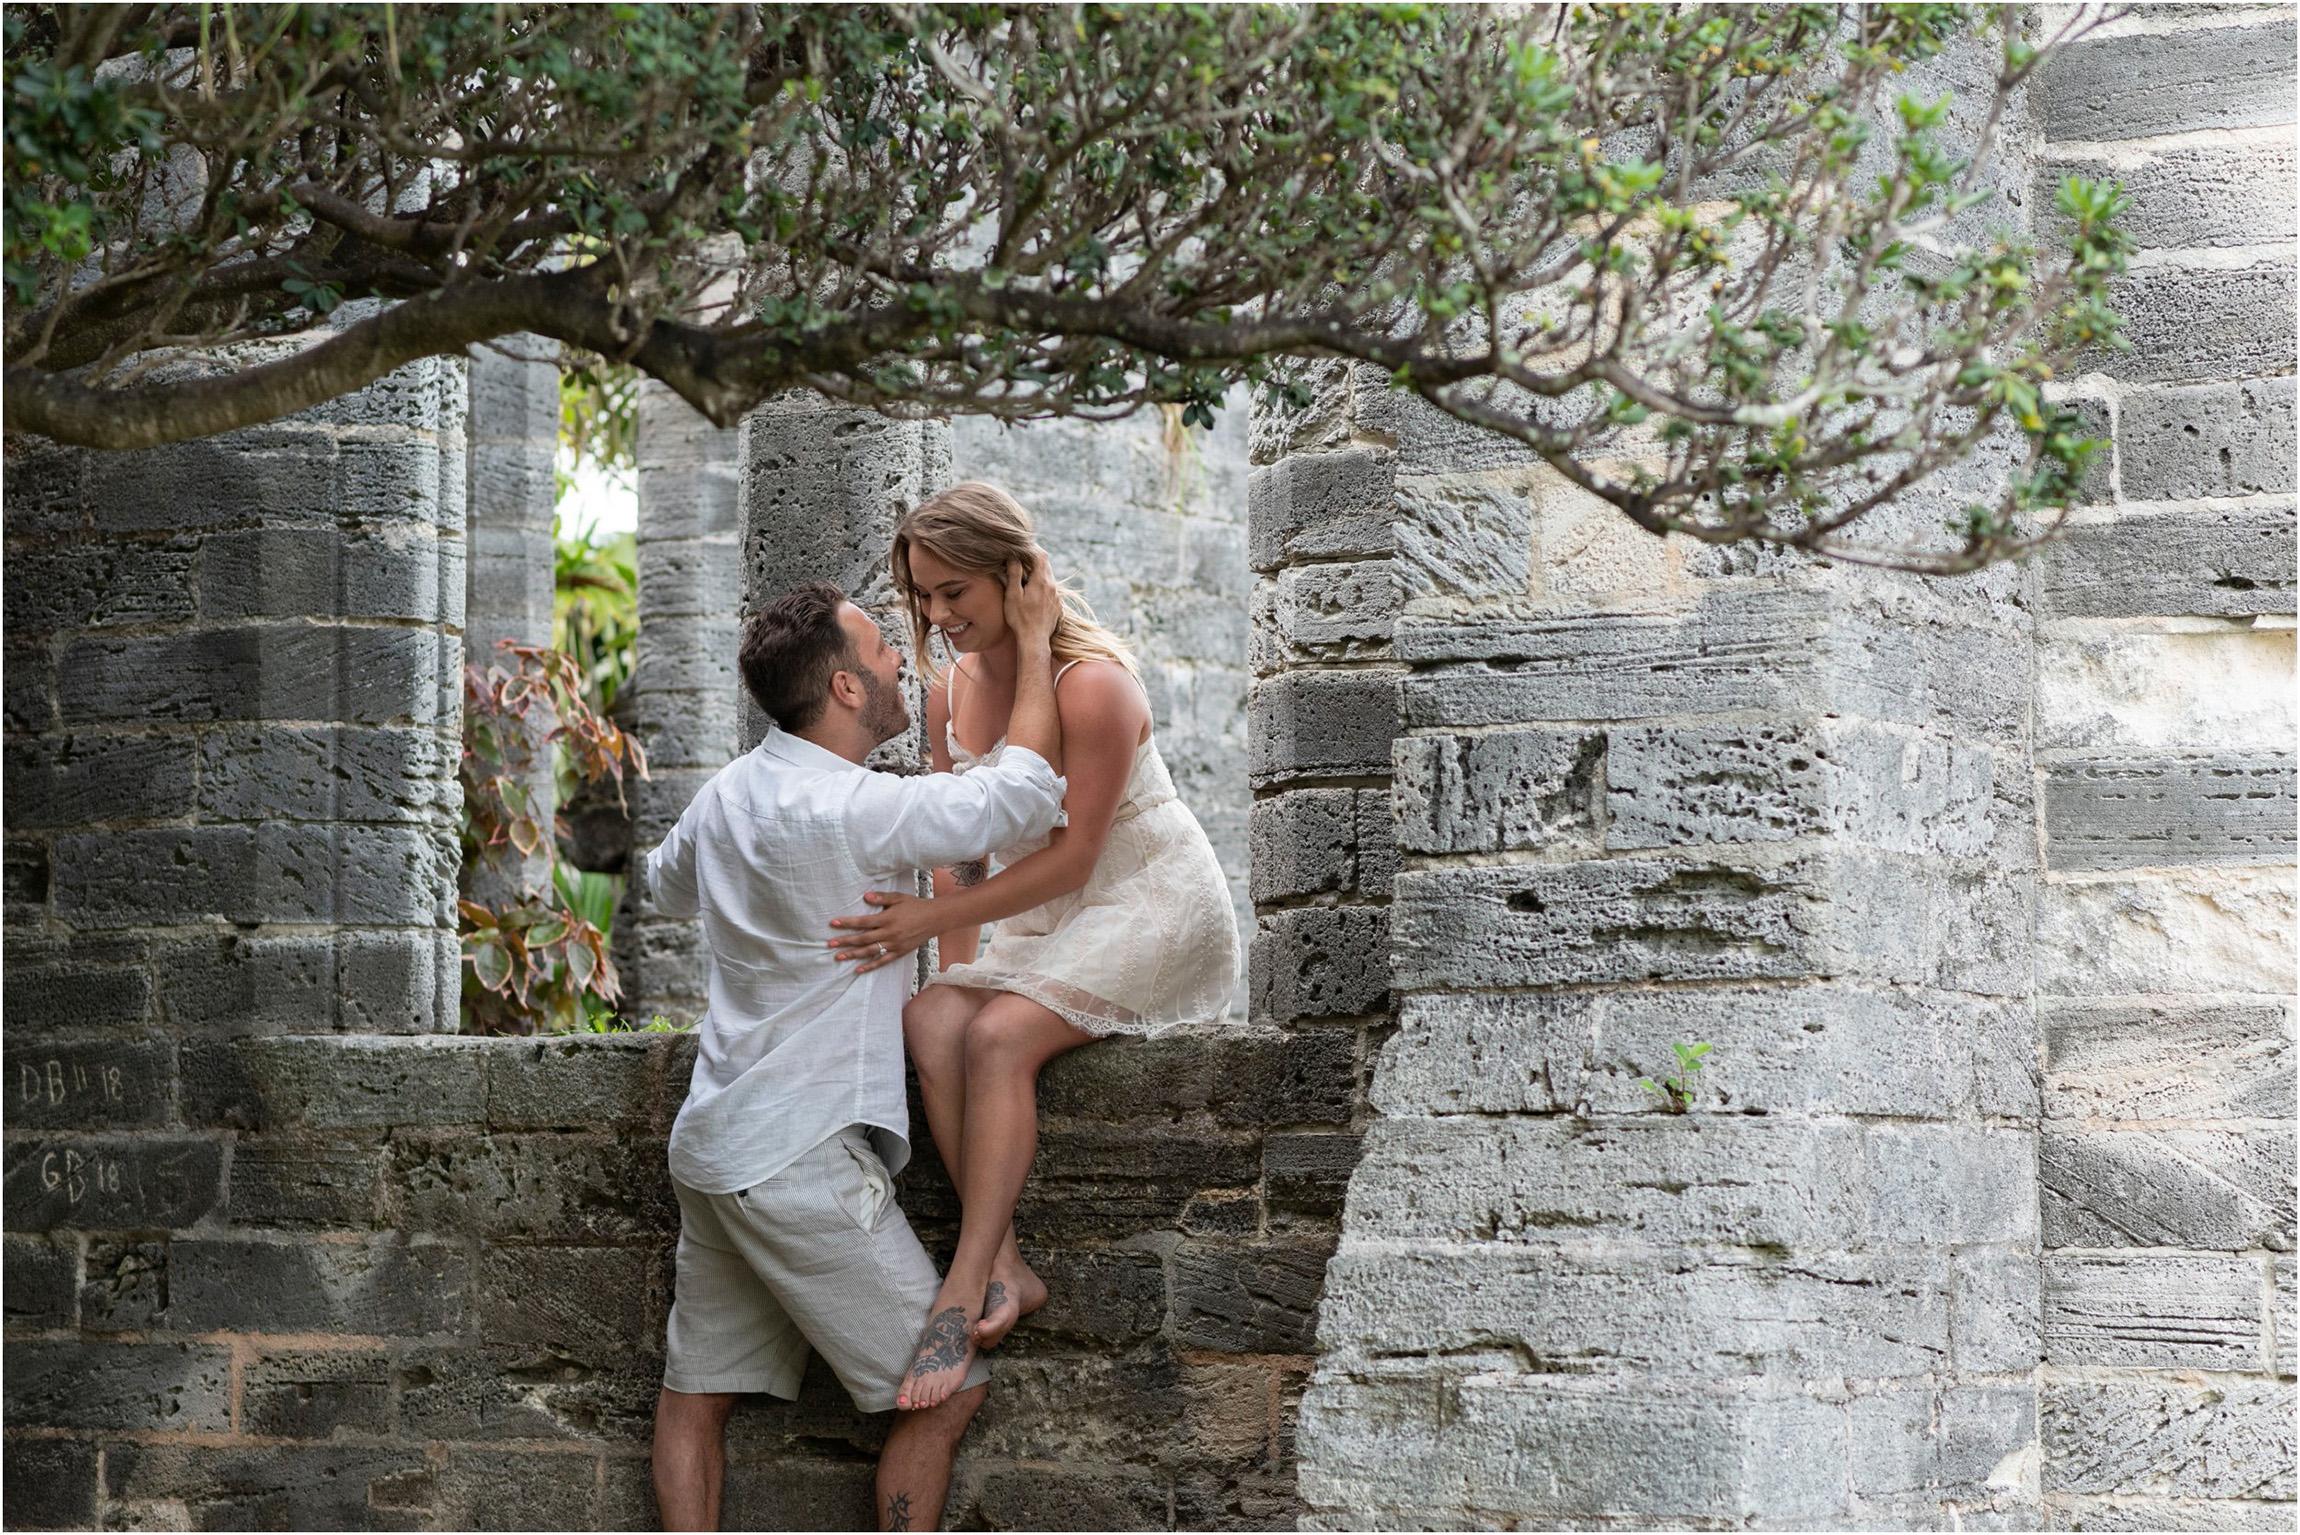 ©FianderFoto_Bermuda Engagement Photographer_St Georges_Danielle_David_012.jpg